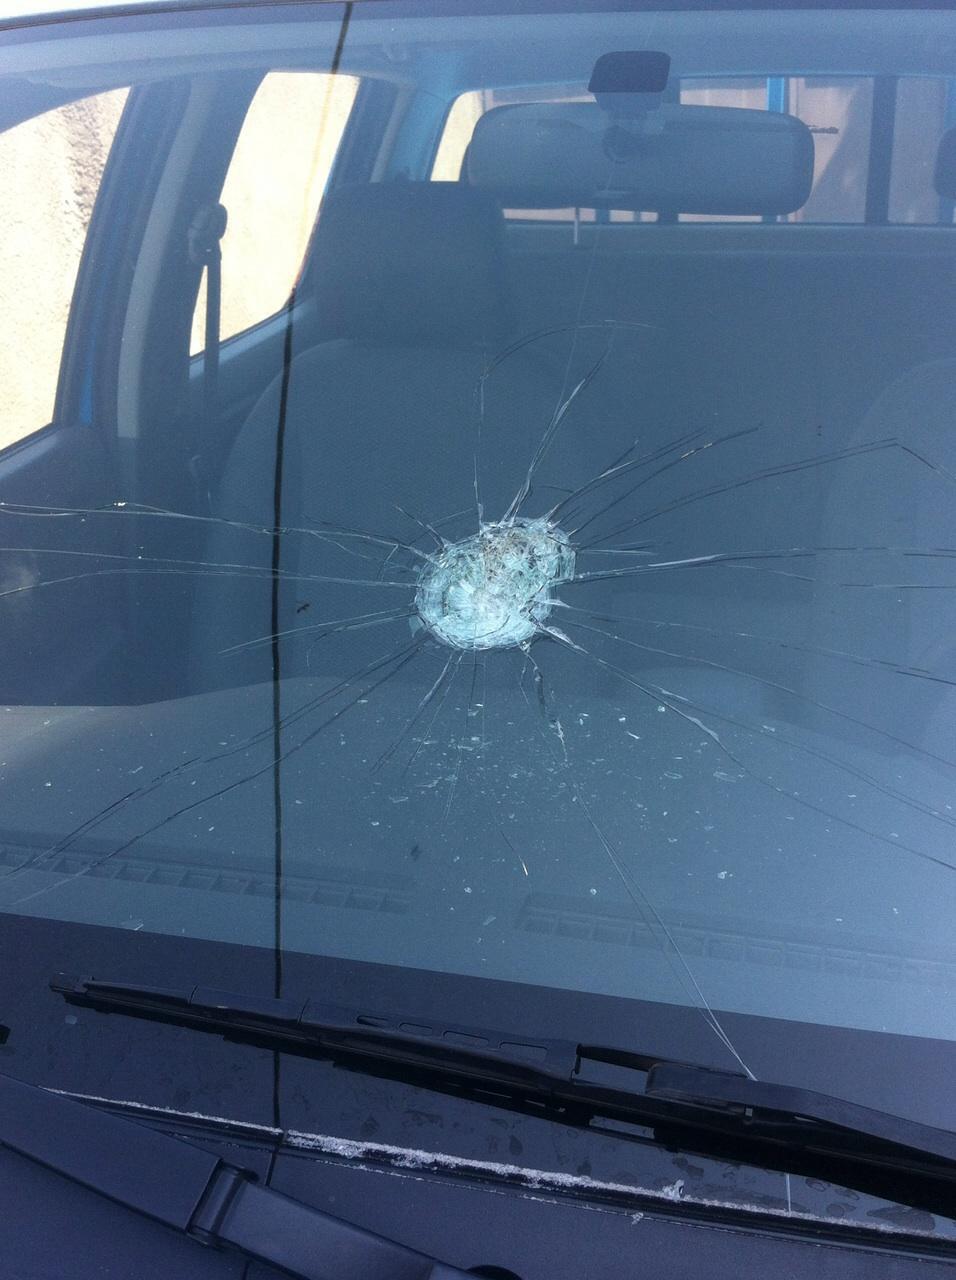 Bullet impact violence Musaga